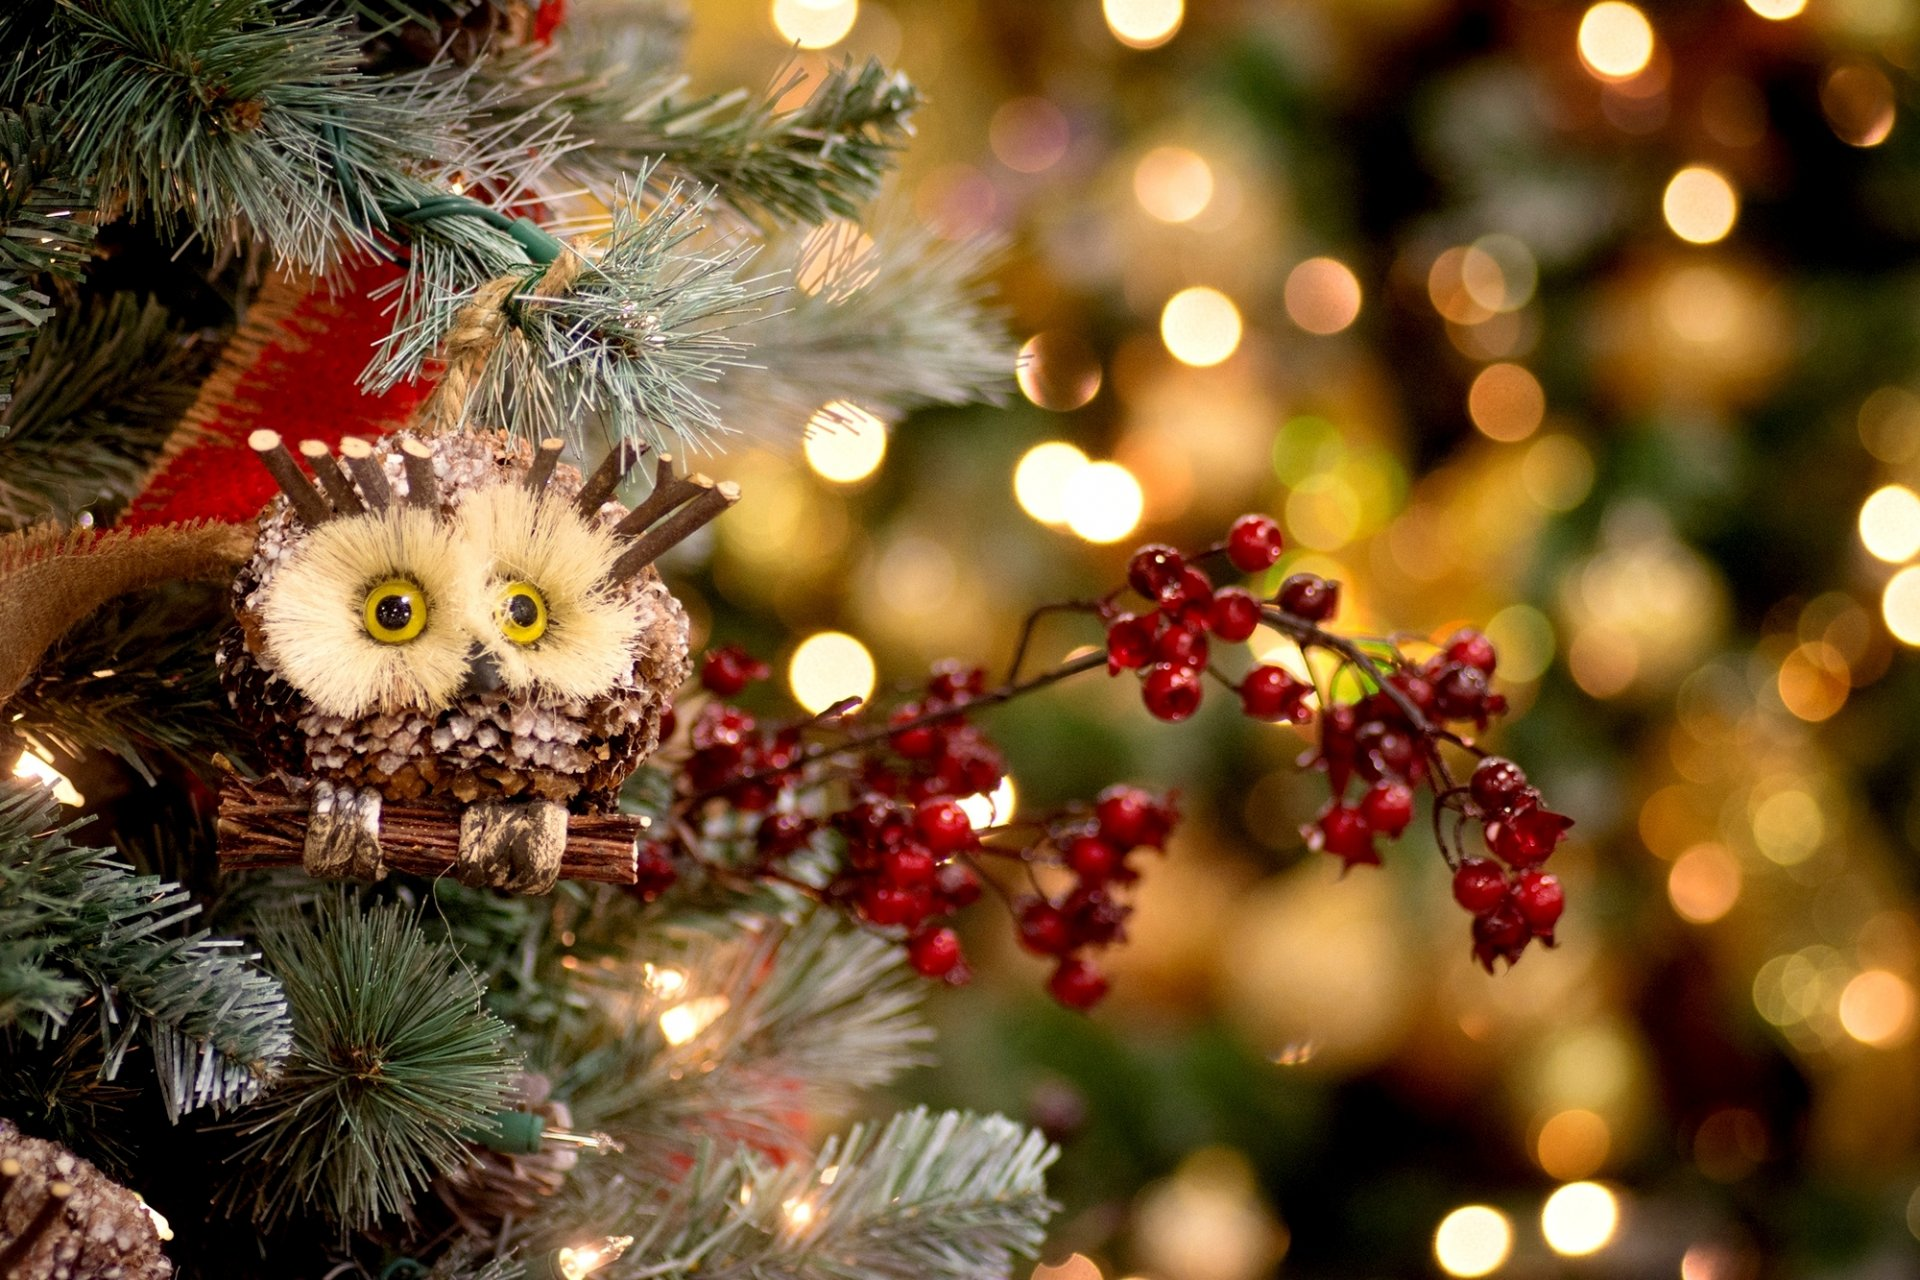 елка игрушки новый год tree toys new year загрузить